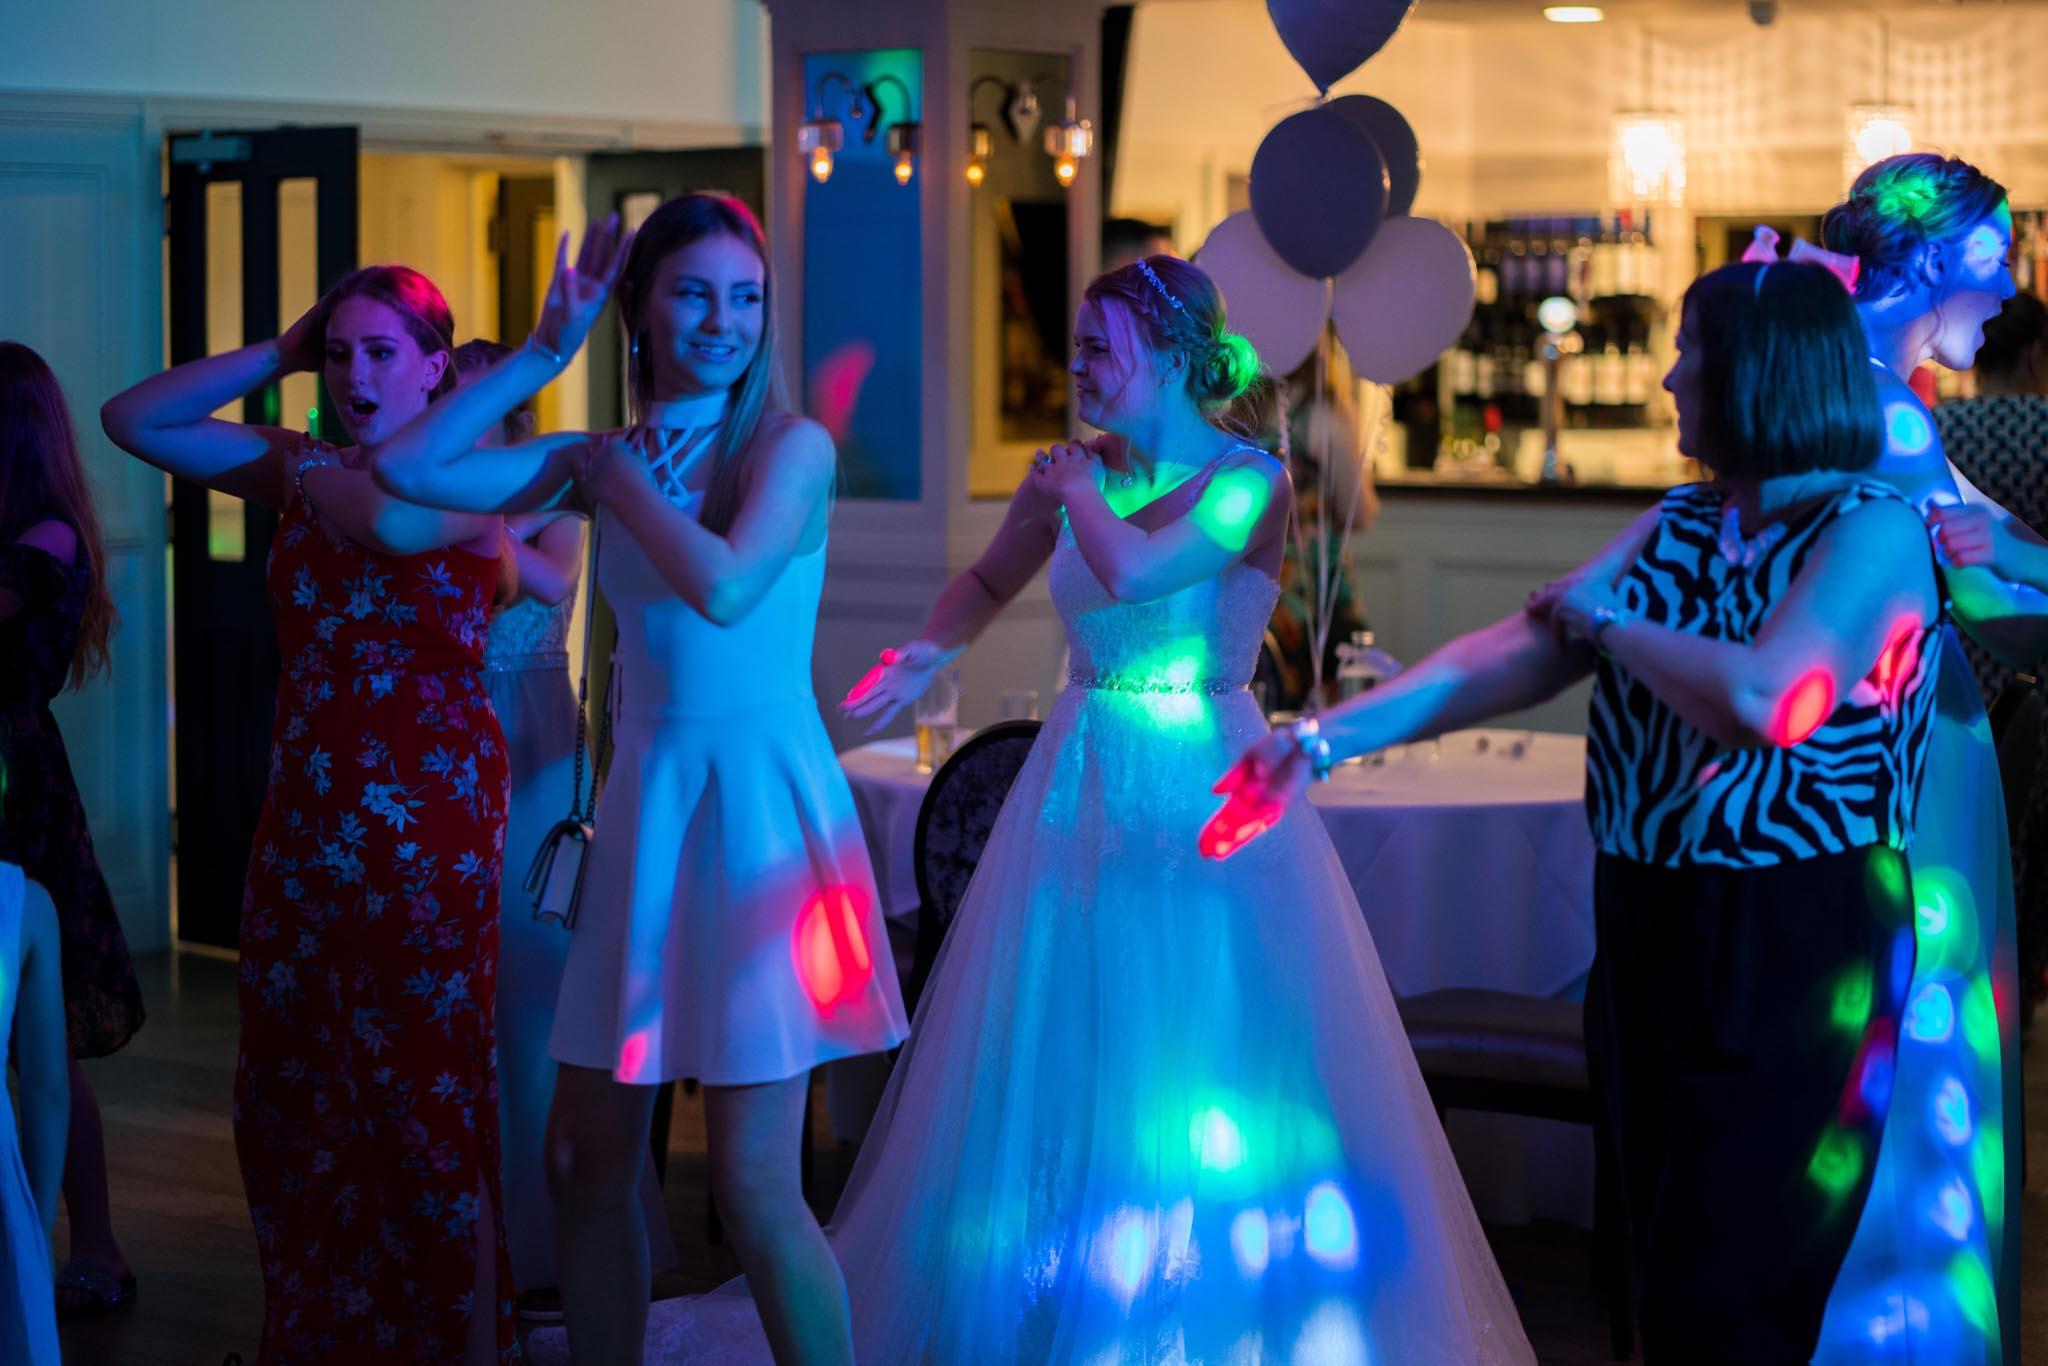 1088-Night-Reception-Luke-Yasmin-The-Rayleigh-Club-Wedding-Photography.jpg